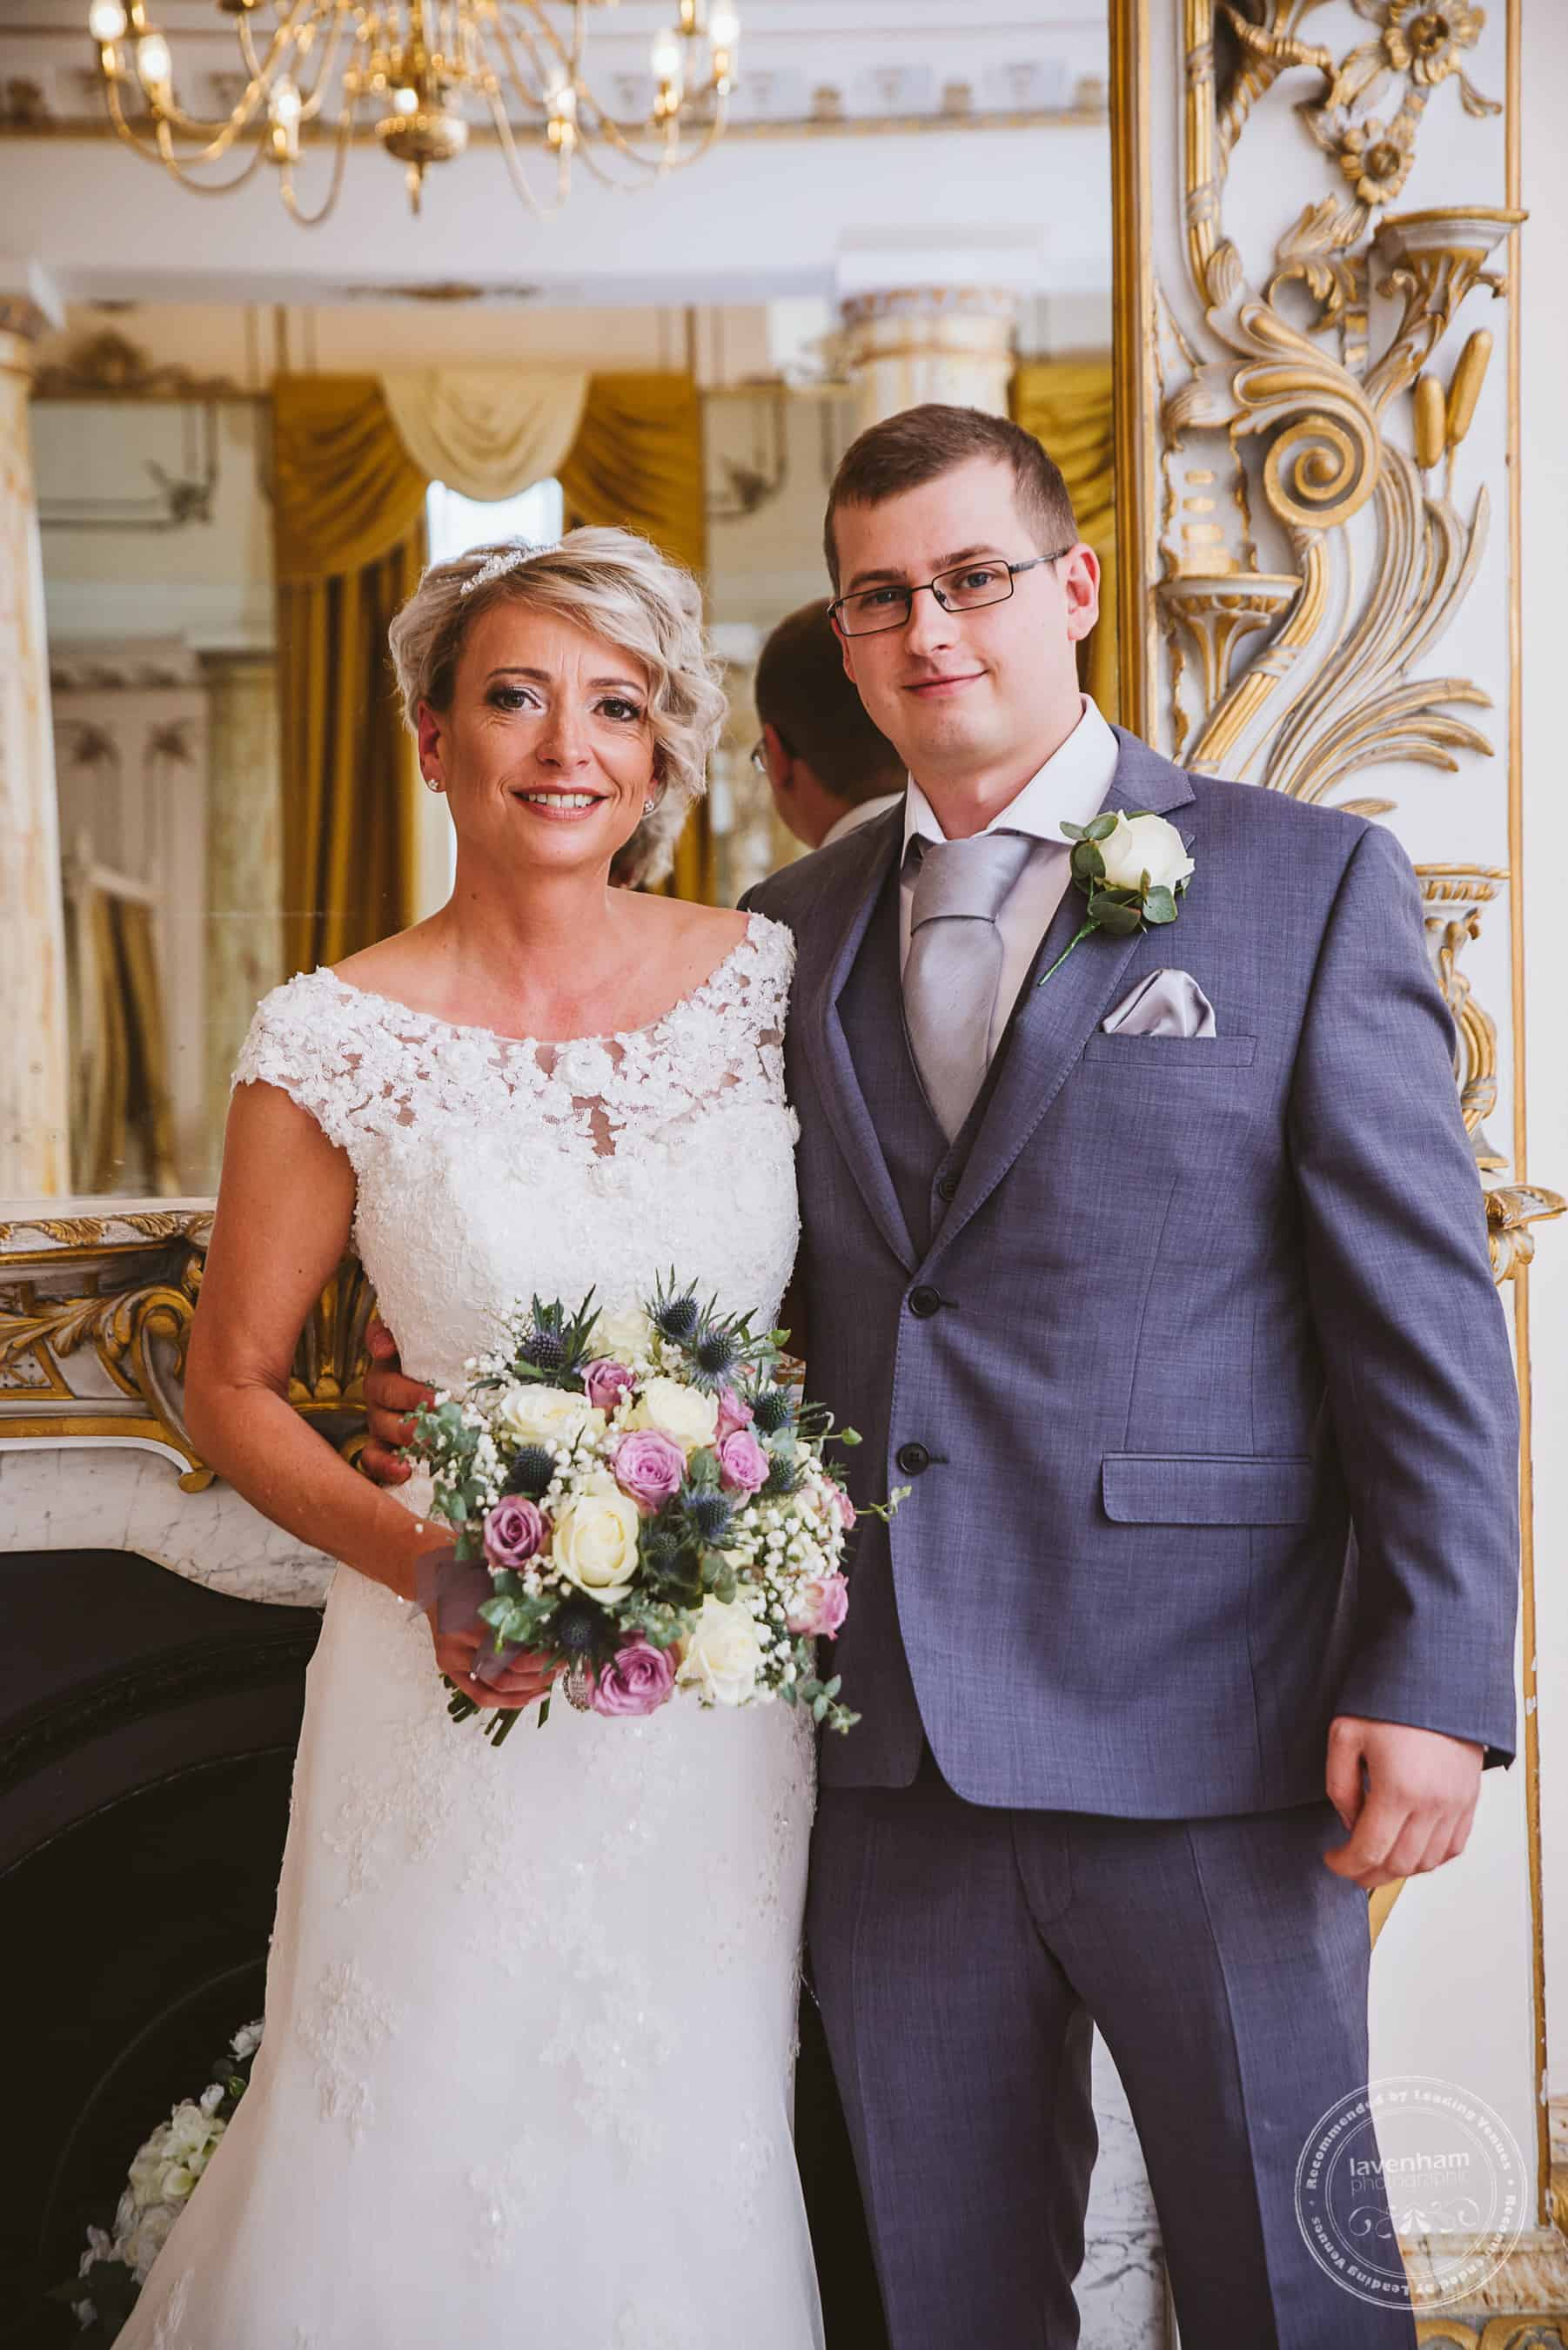 281018 Gosfield Hall Wedding Photography Lavenham Photographic 042